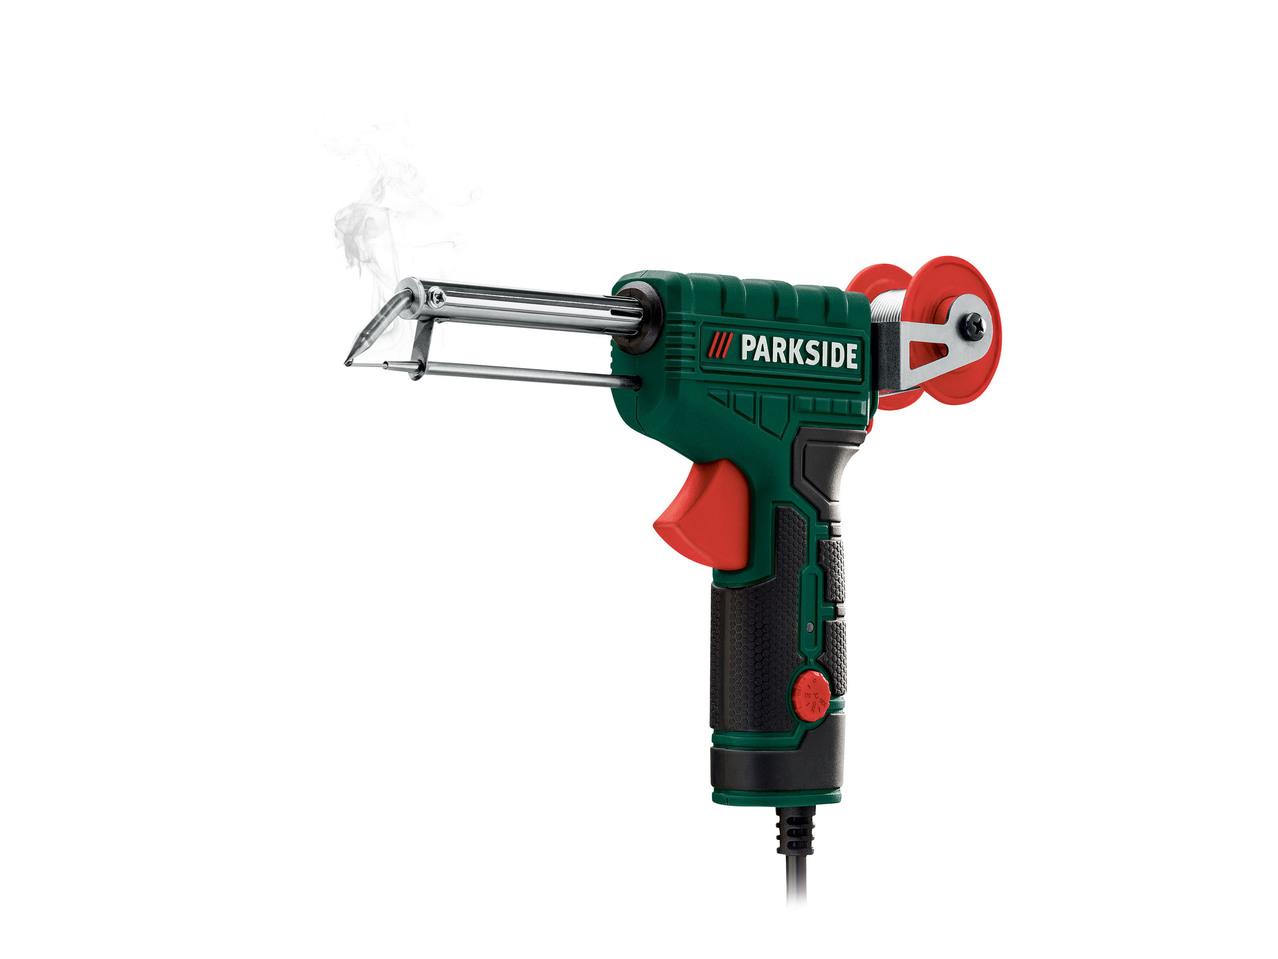 Saldatore a pistola con avanzamento automatico dello for Pistola pneumatica parkside